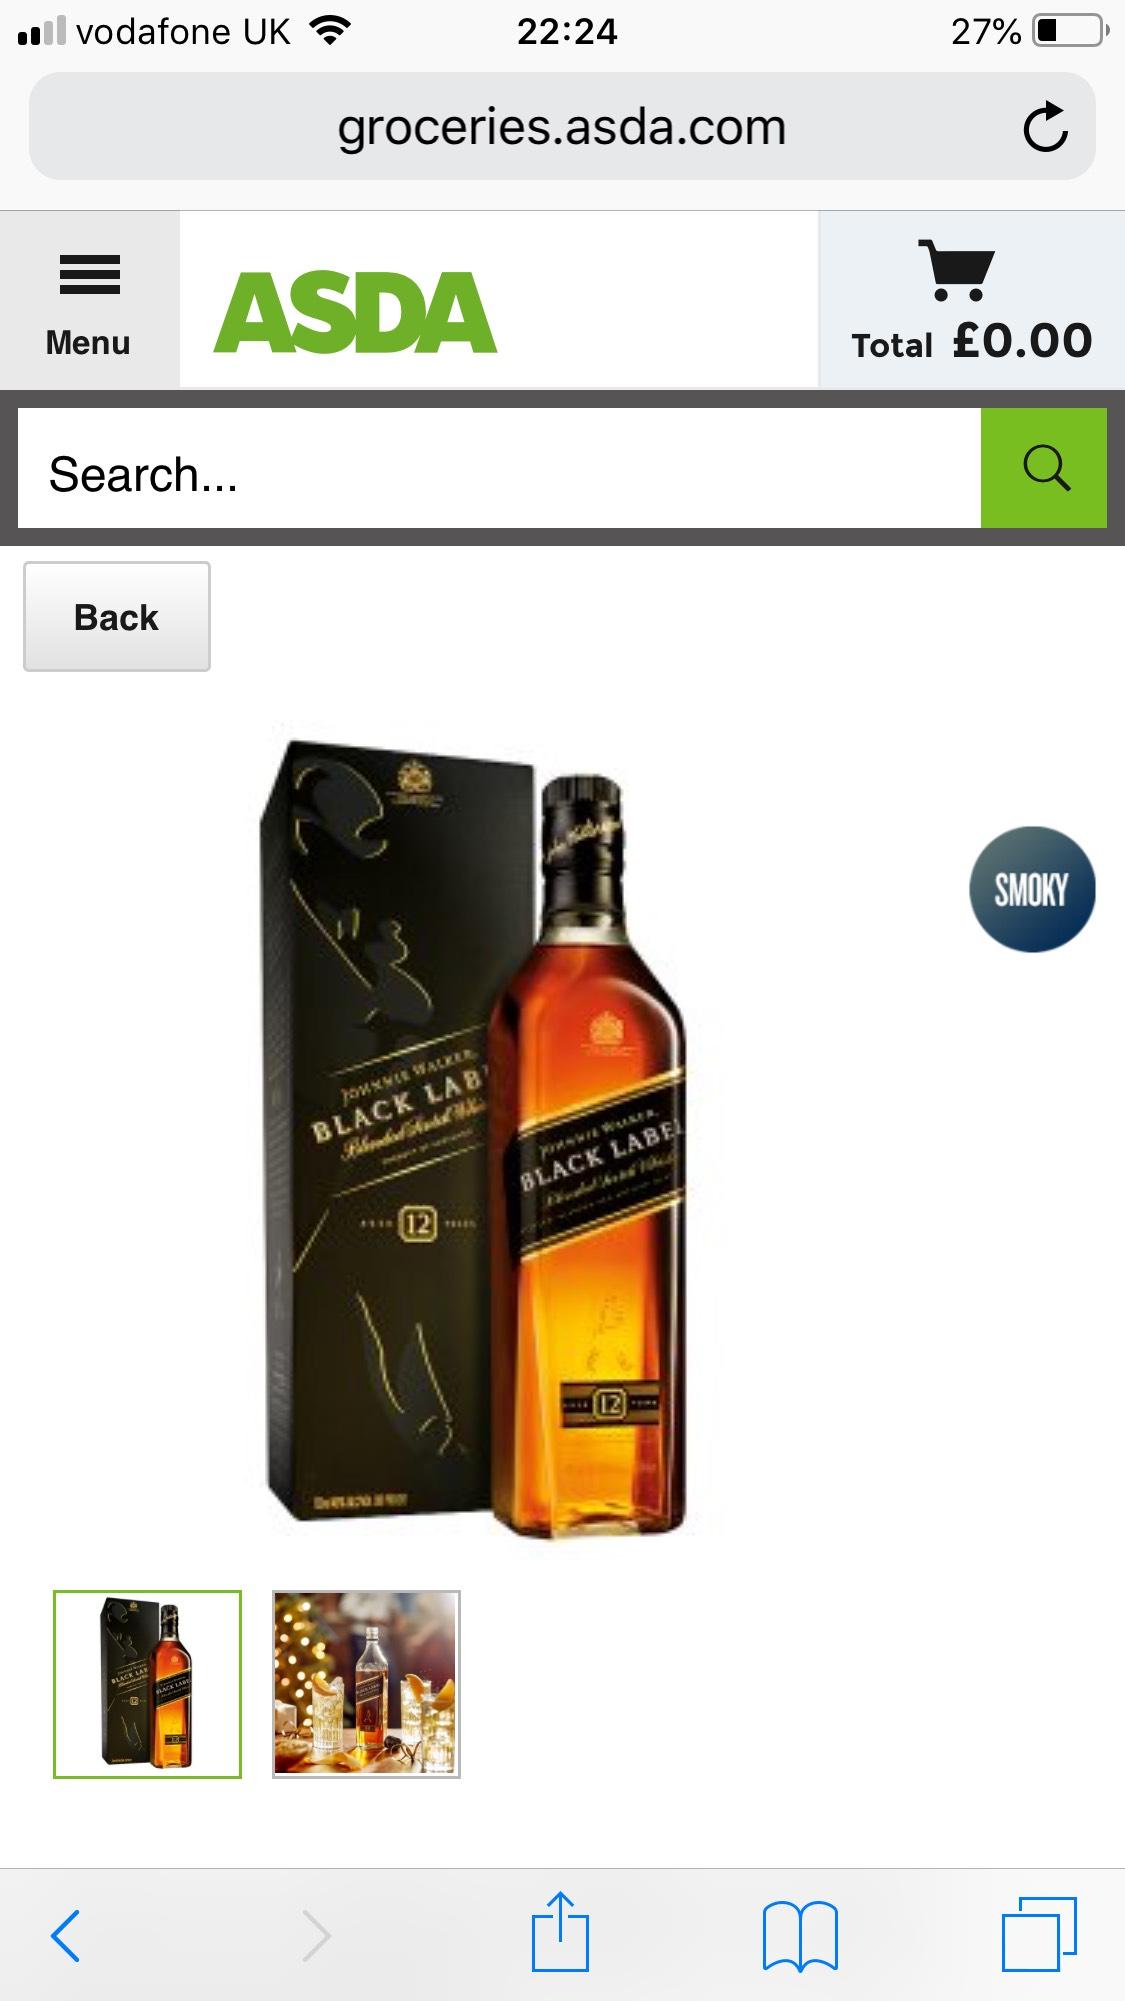 Johnnie Walker black label  Scotch Whisky 70cl at ASDA - £20 (also on Amazon)